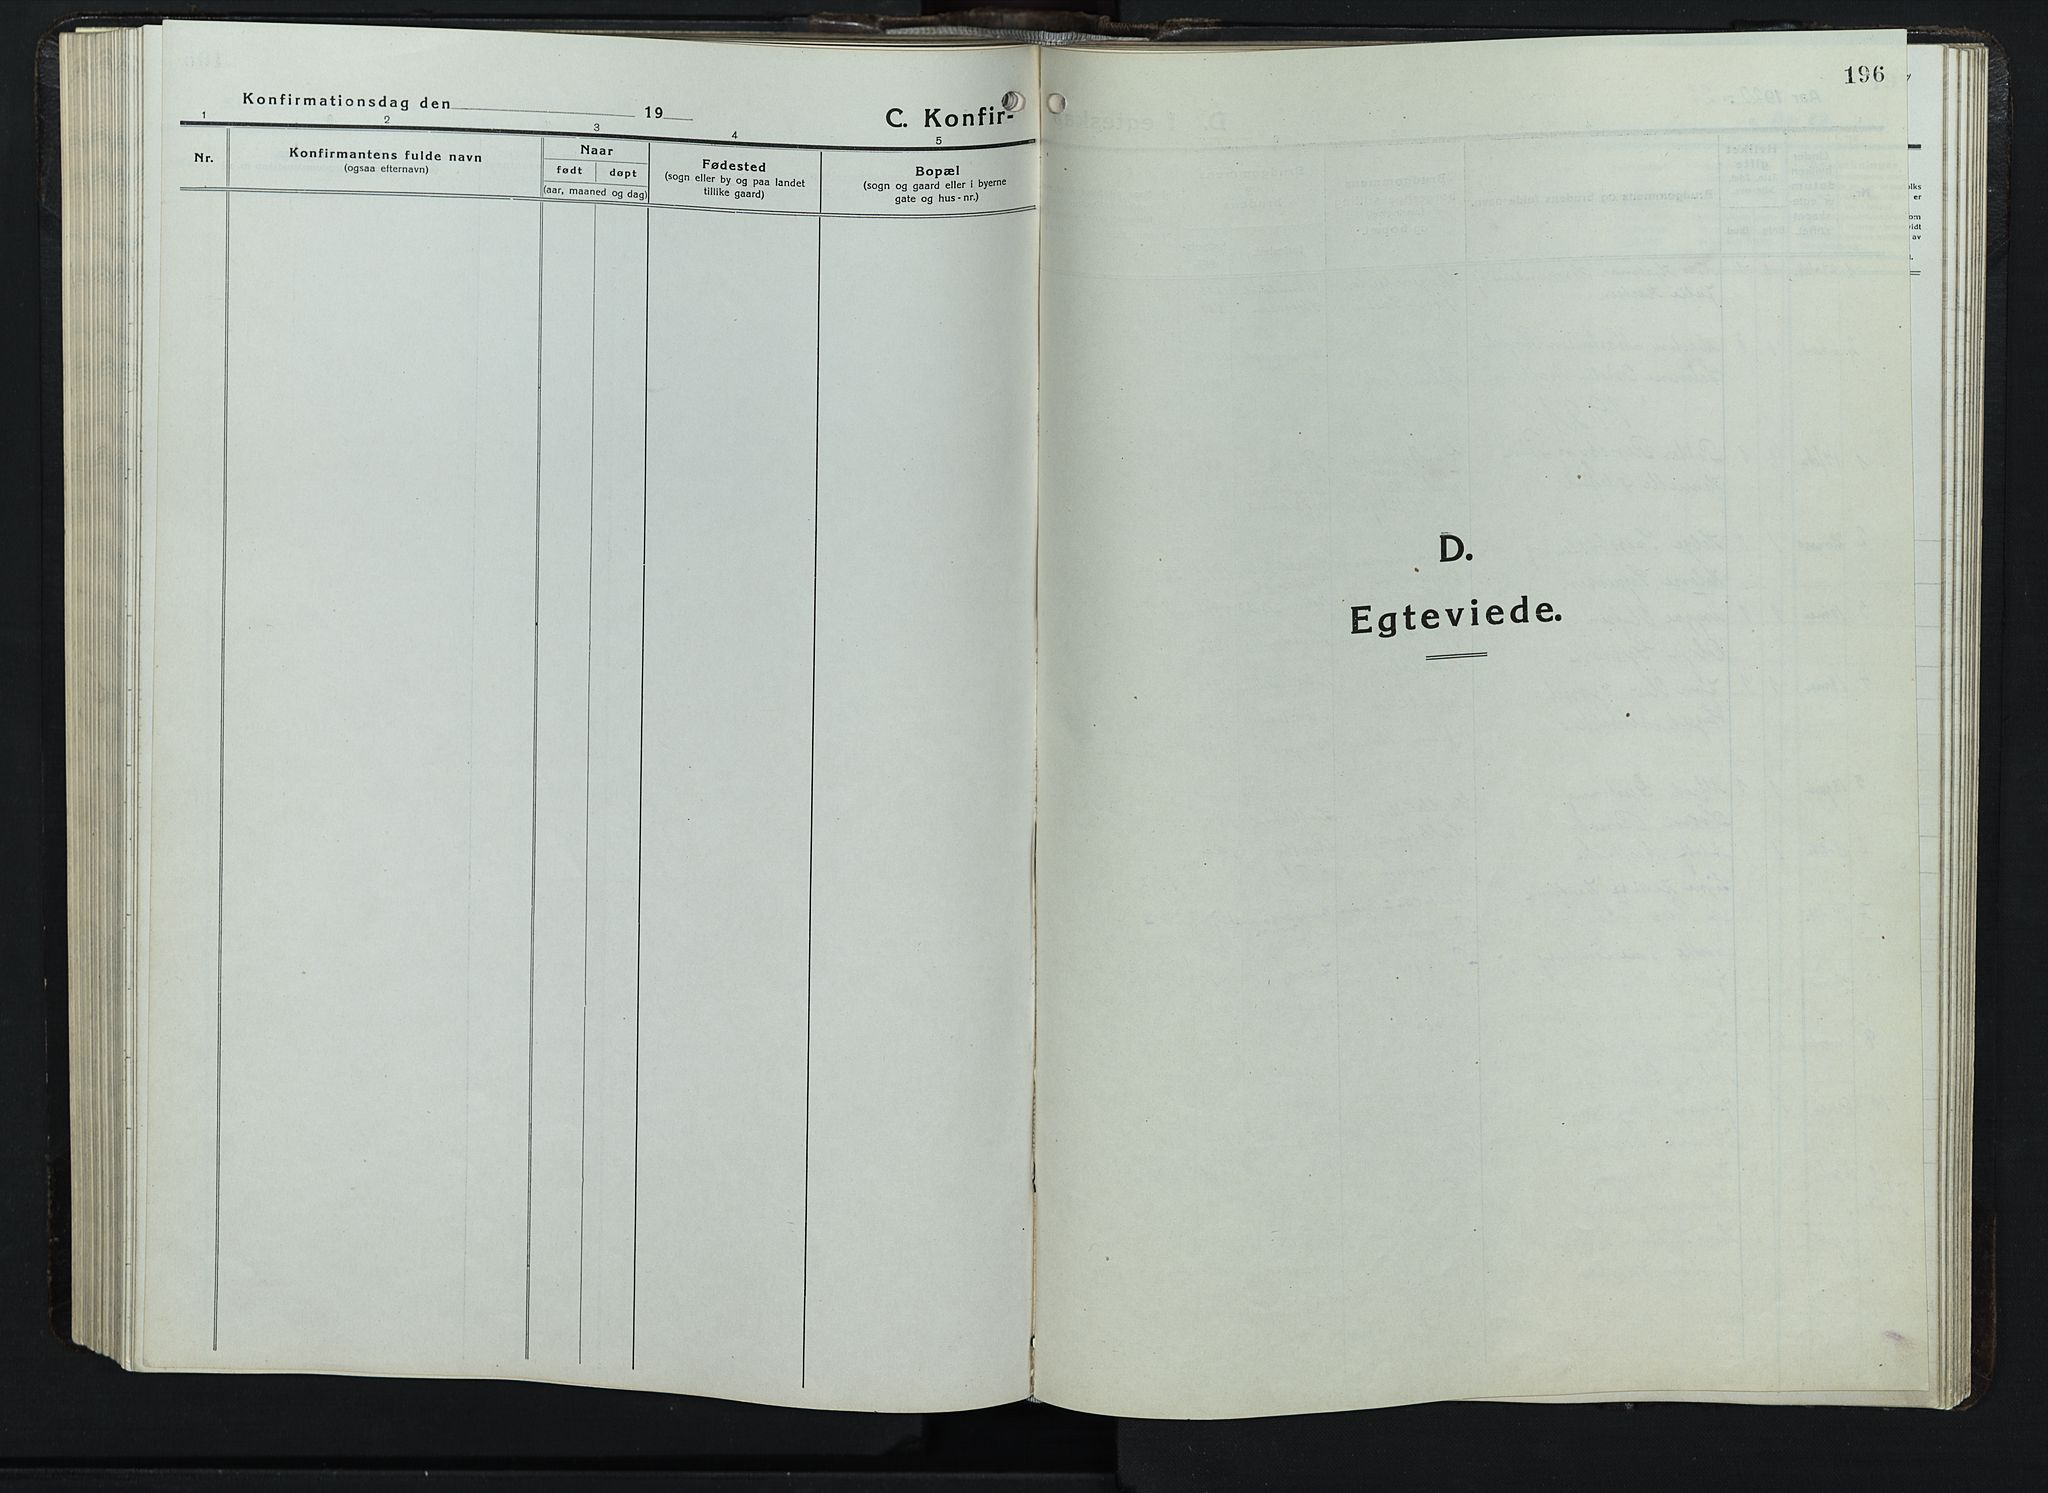 SAH, Balke prestekontor, Klokkerbok nr. 1, 1920-1955, s. 196